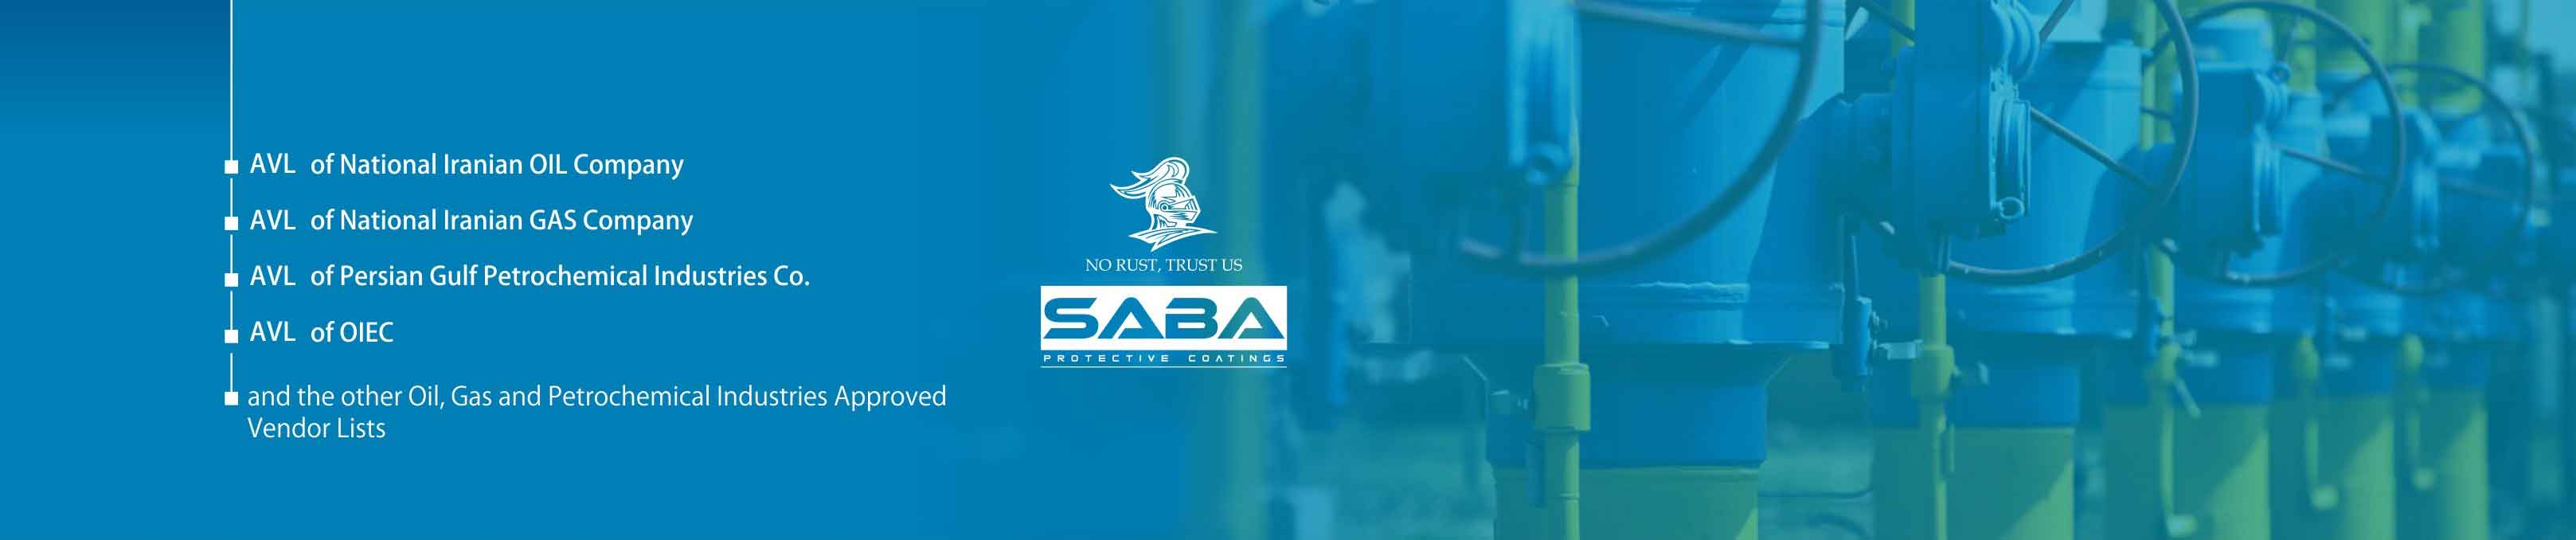 Saba-Slim-Slider-3-English web